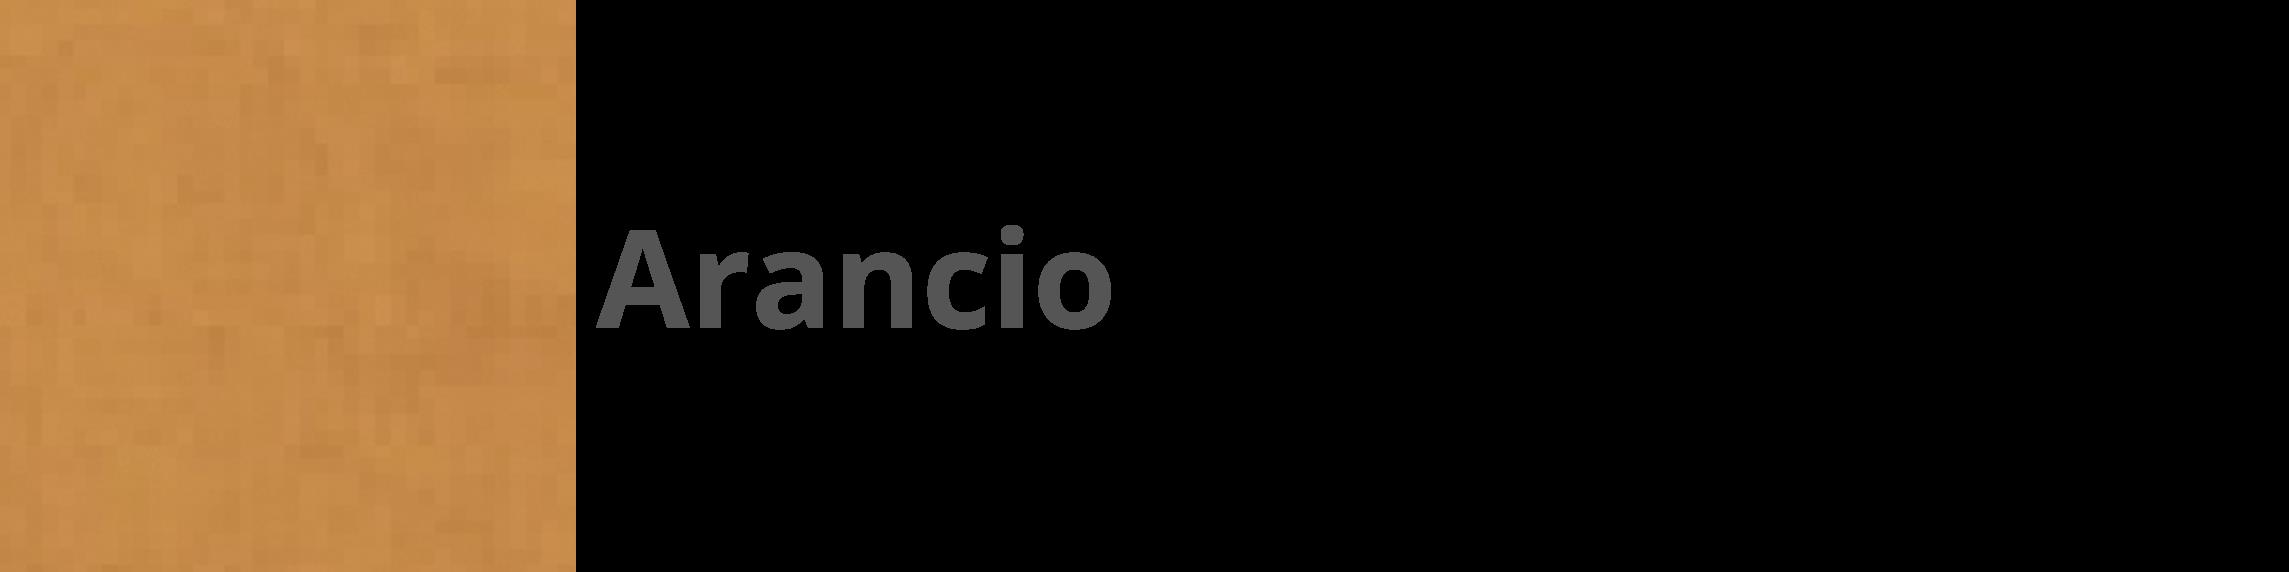 6N06 Microfibra Arancio